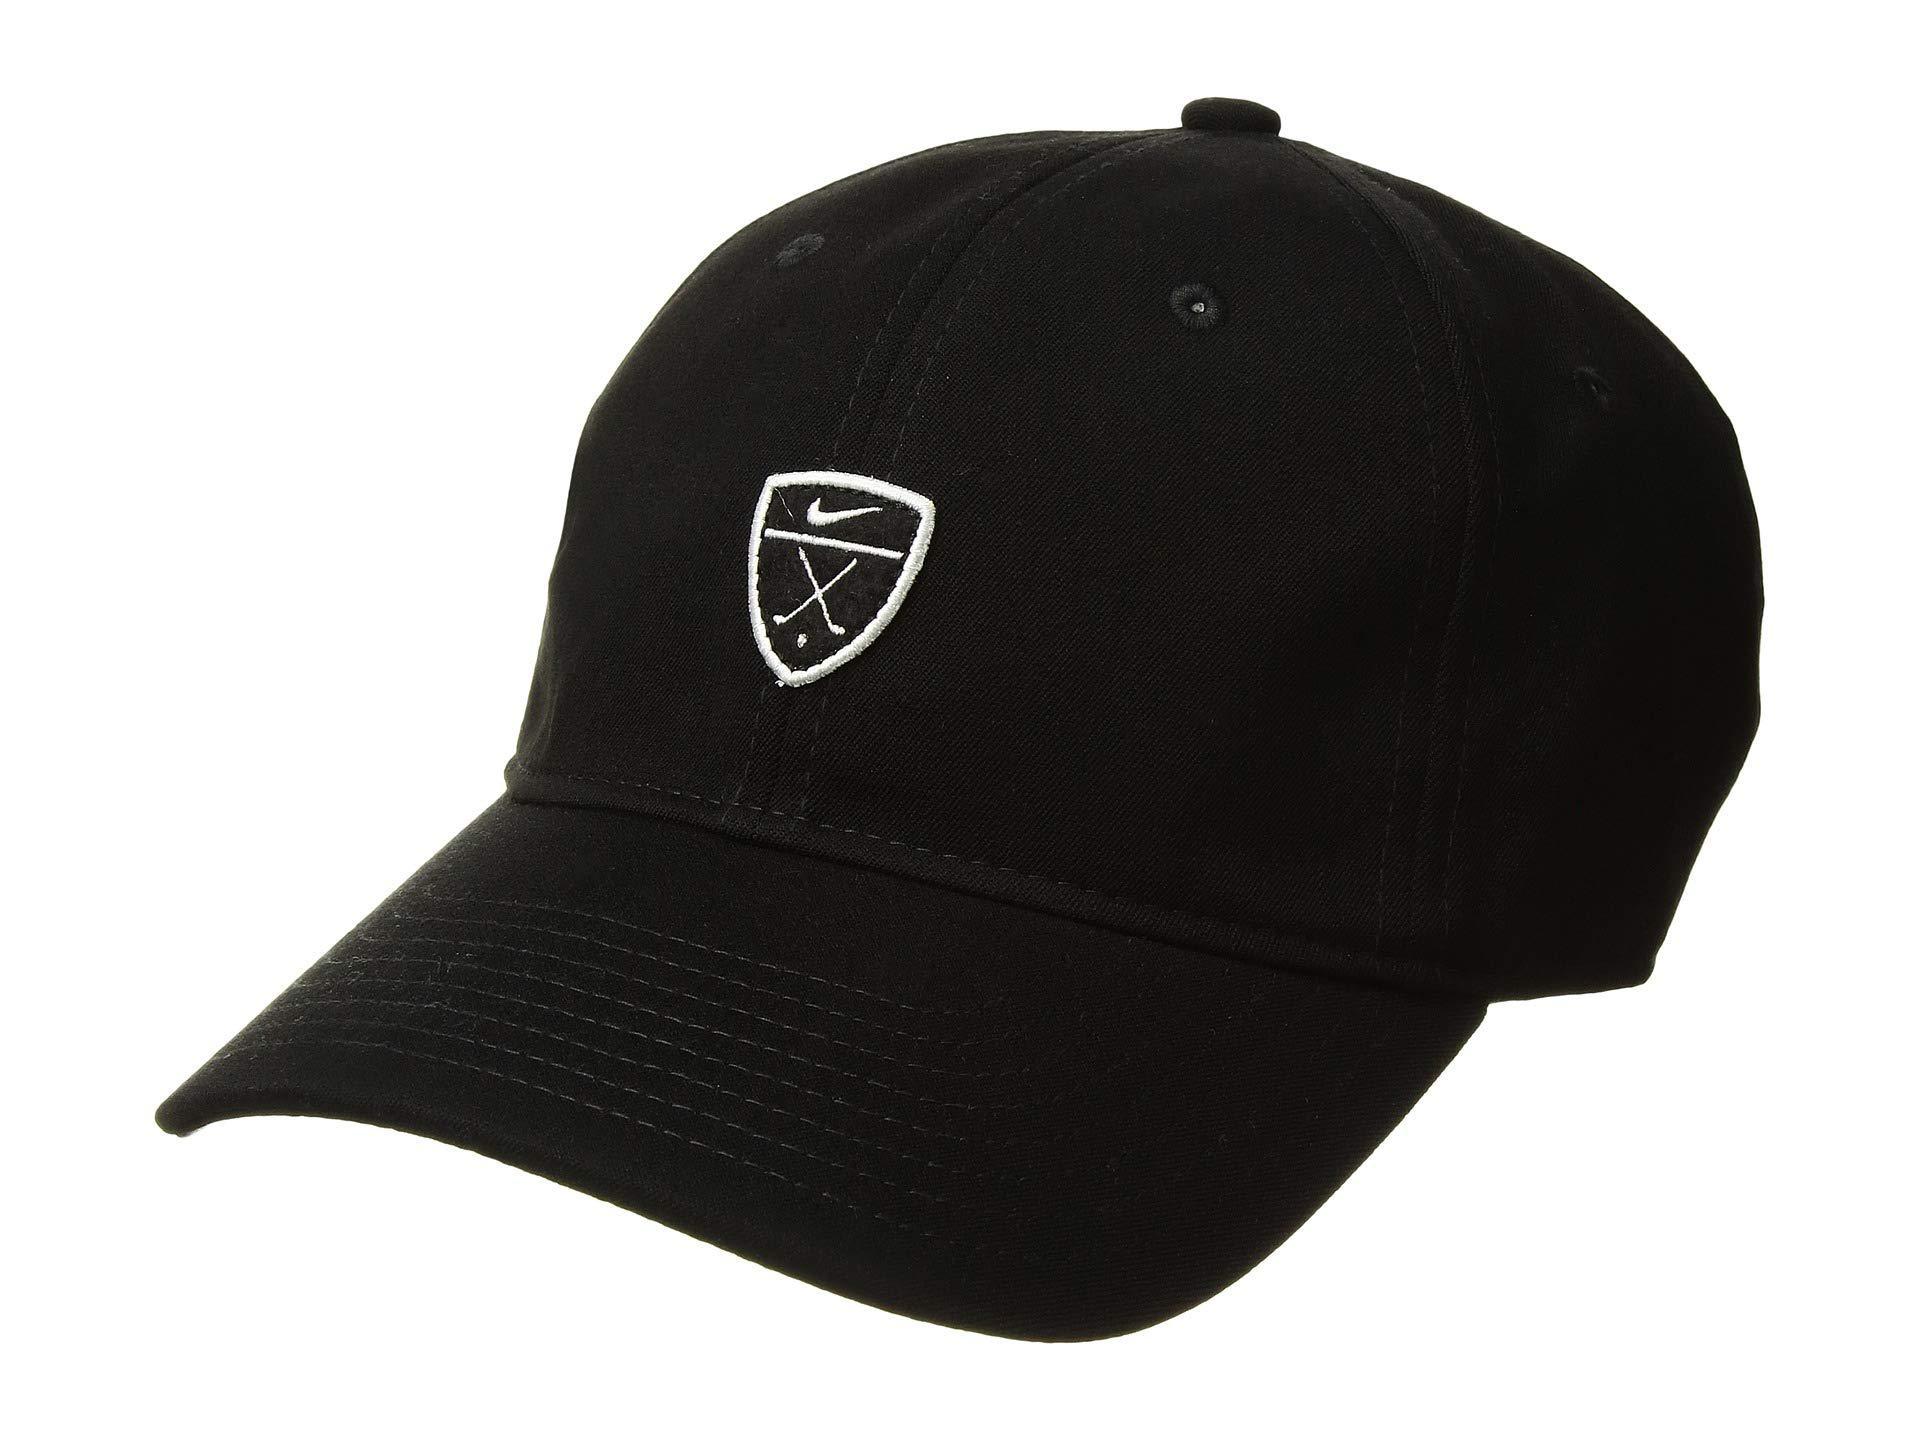 326c927d4fb Nike. Men s H86 Novelty (charcoal Heather charcoal Heather black) Baseball  Caps